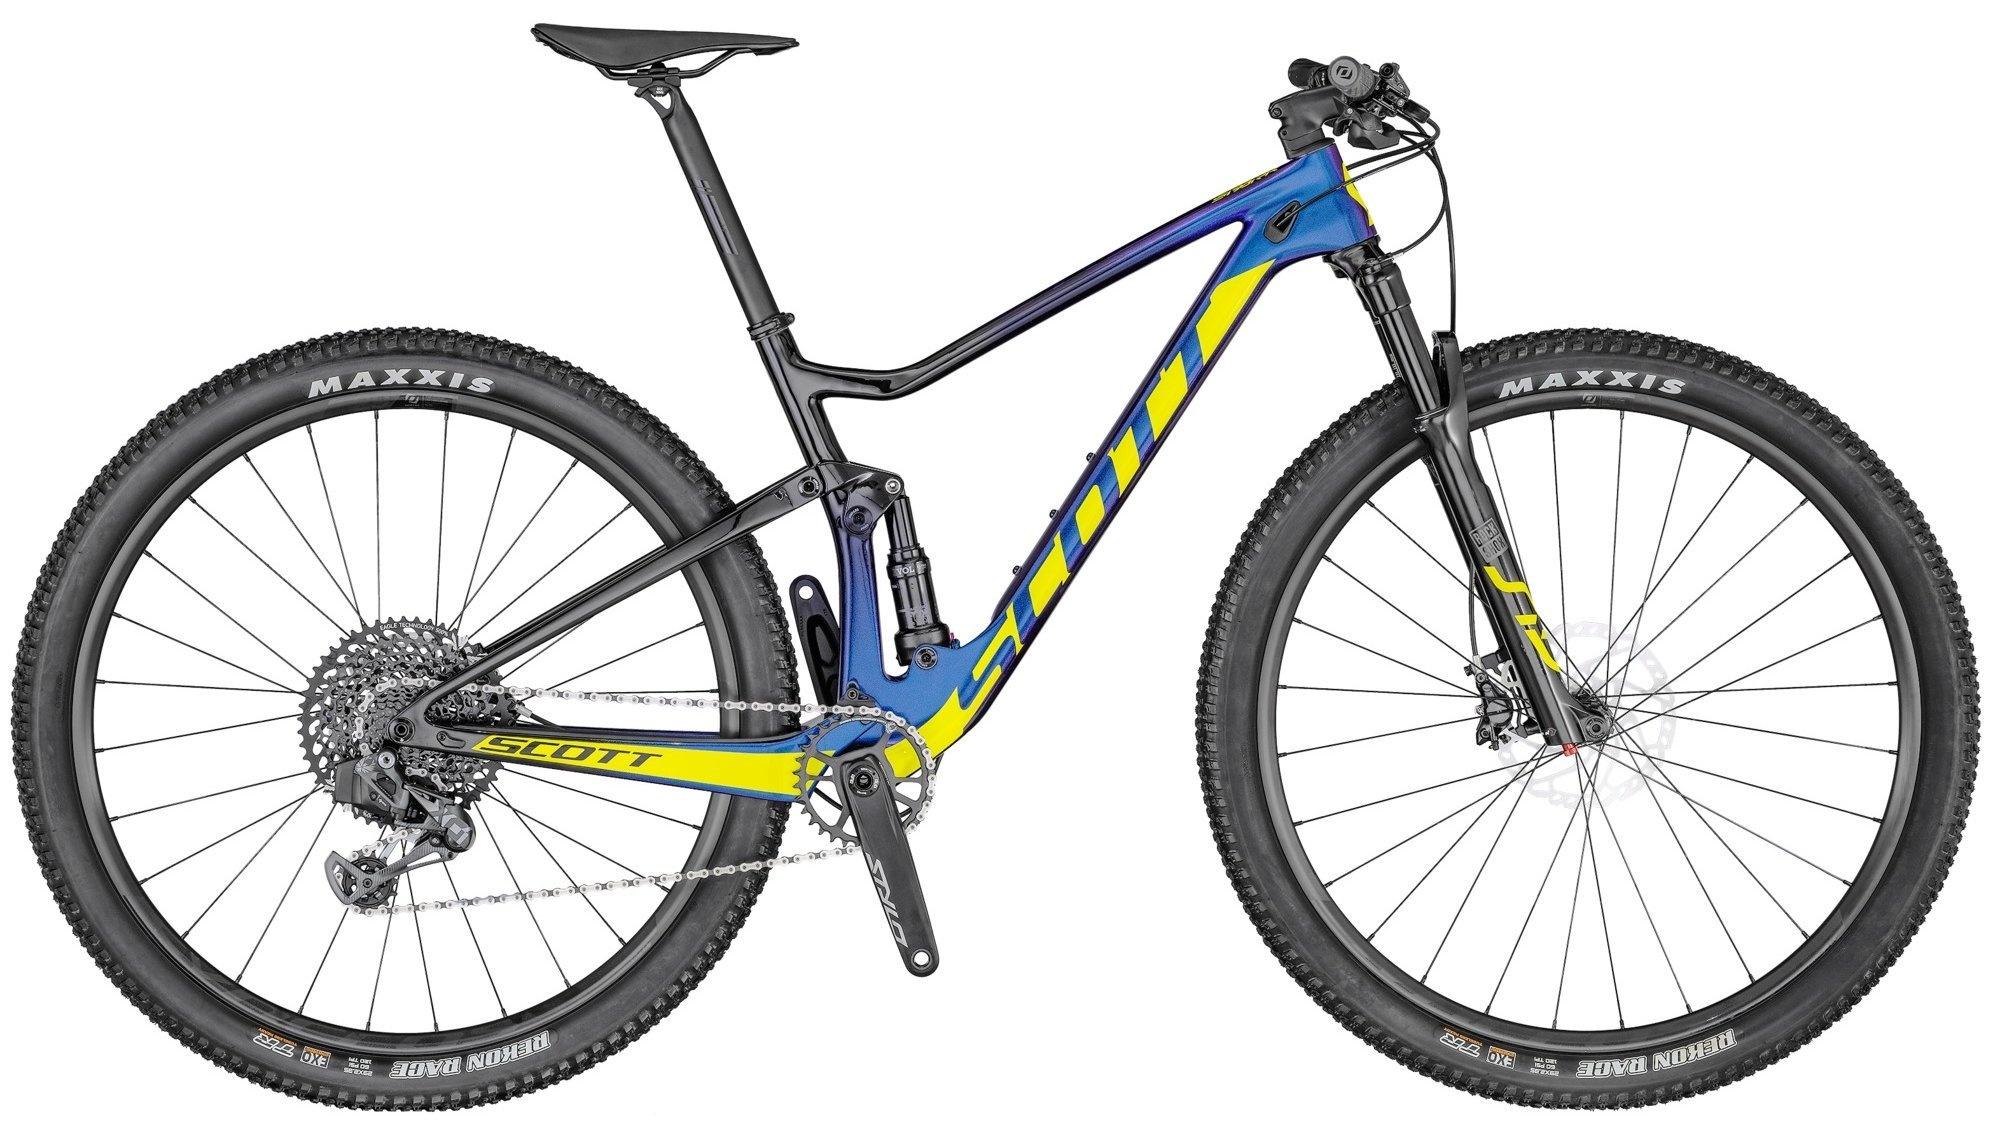 Scott Spark Rc 900 Team Issue Axs 2020 Cykler > Mountainbikes